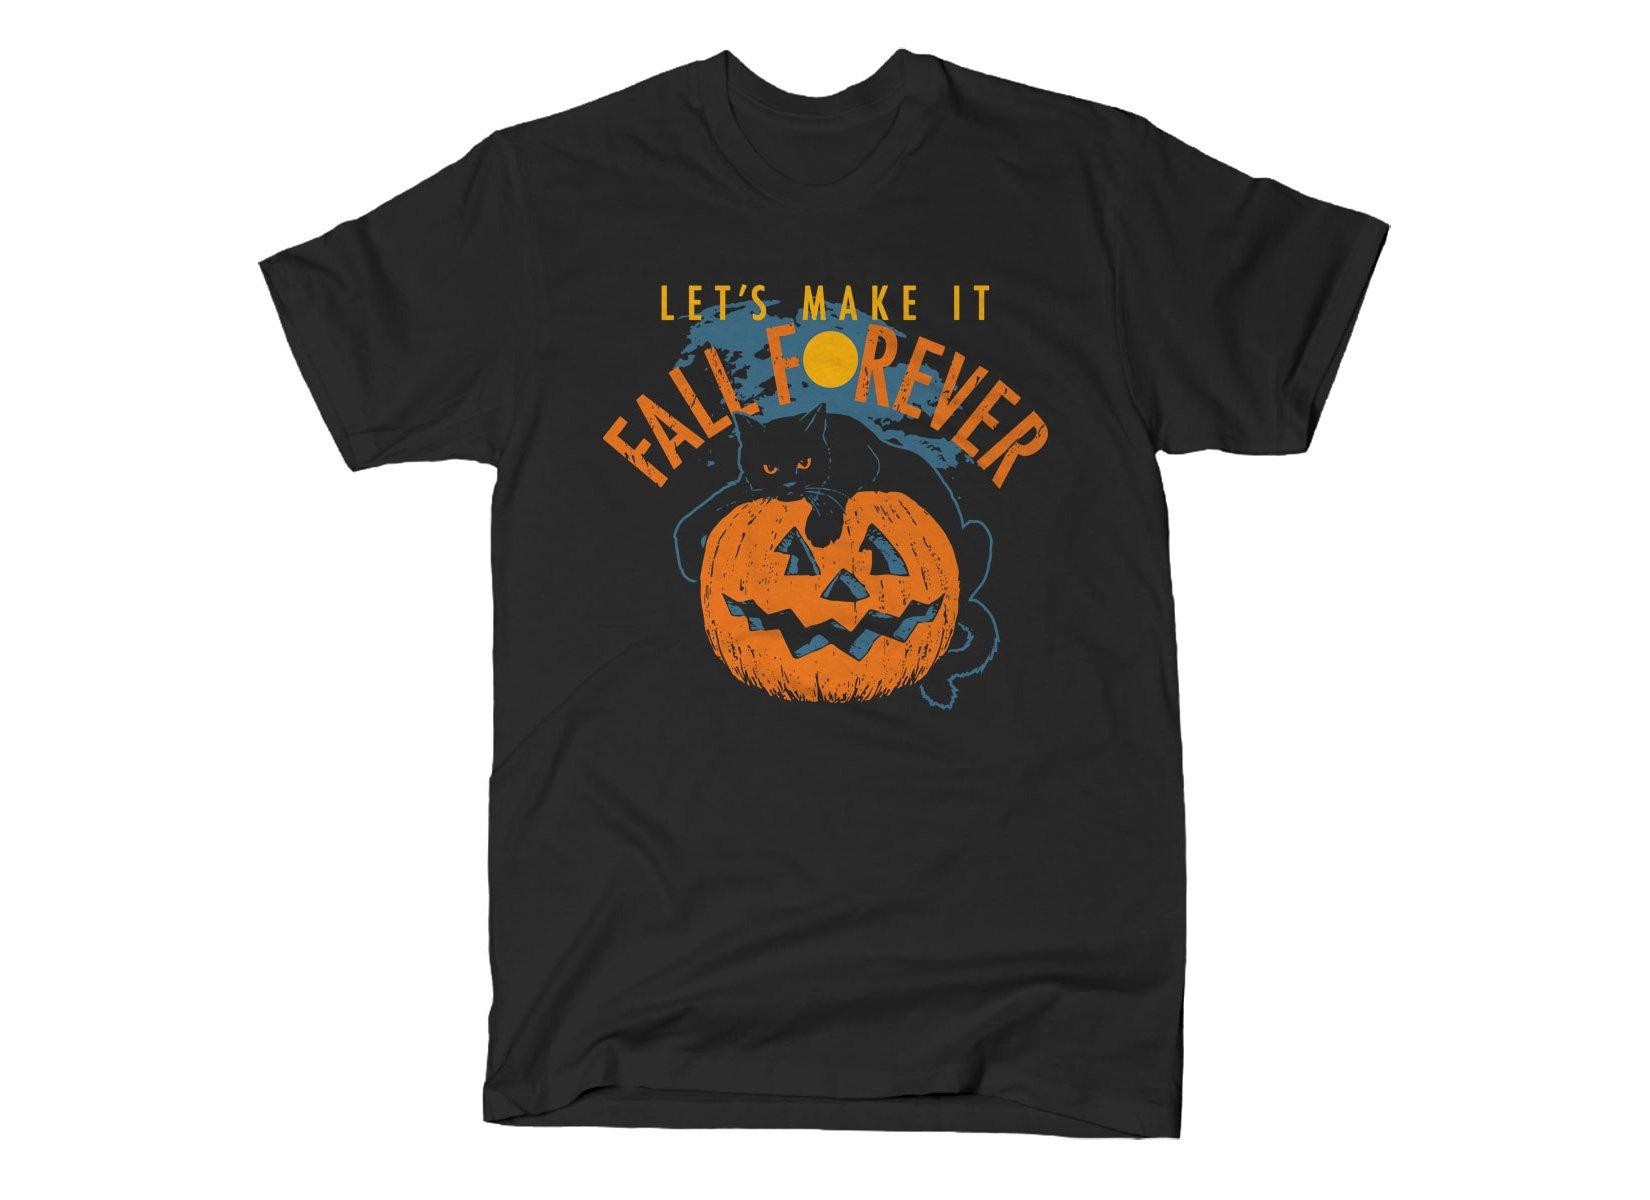 Fall Forever on Mens T-Shirt